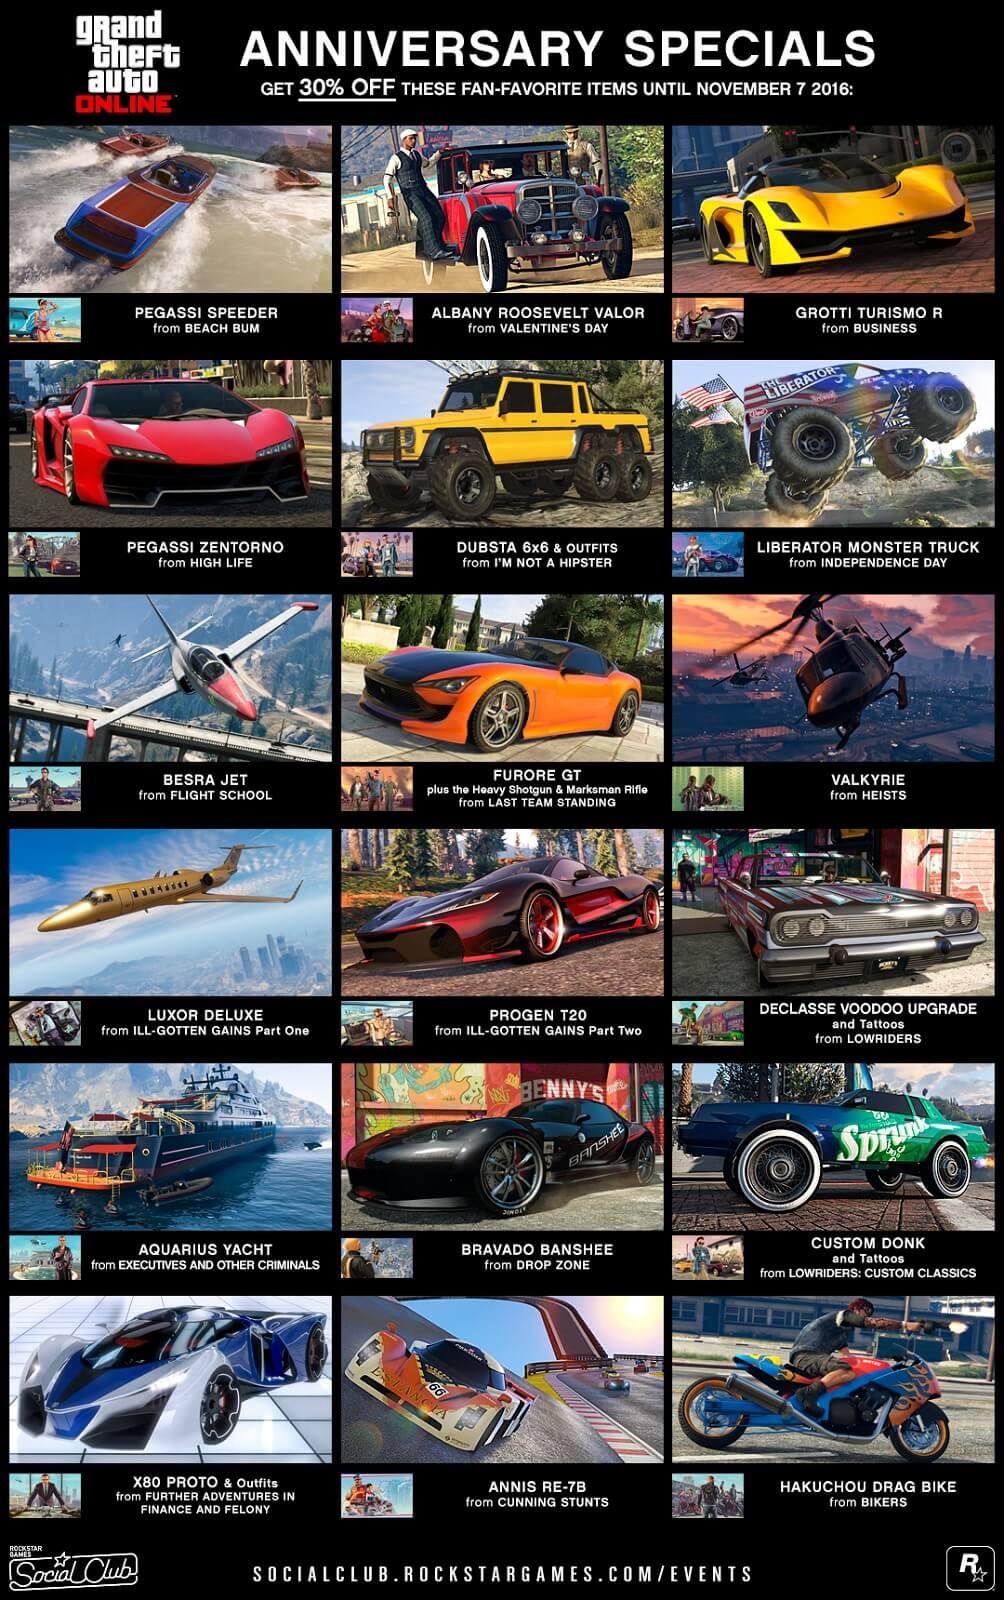 GTA V Celebrates Three Years With $250,000 Login Bonus, Discounts